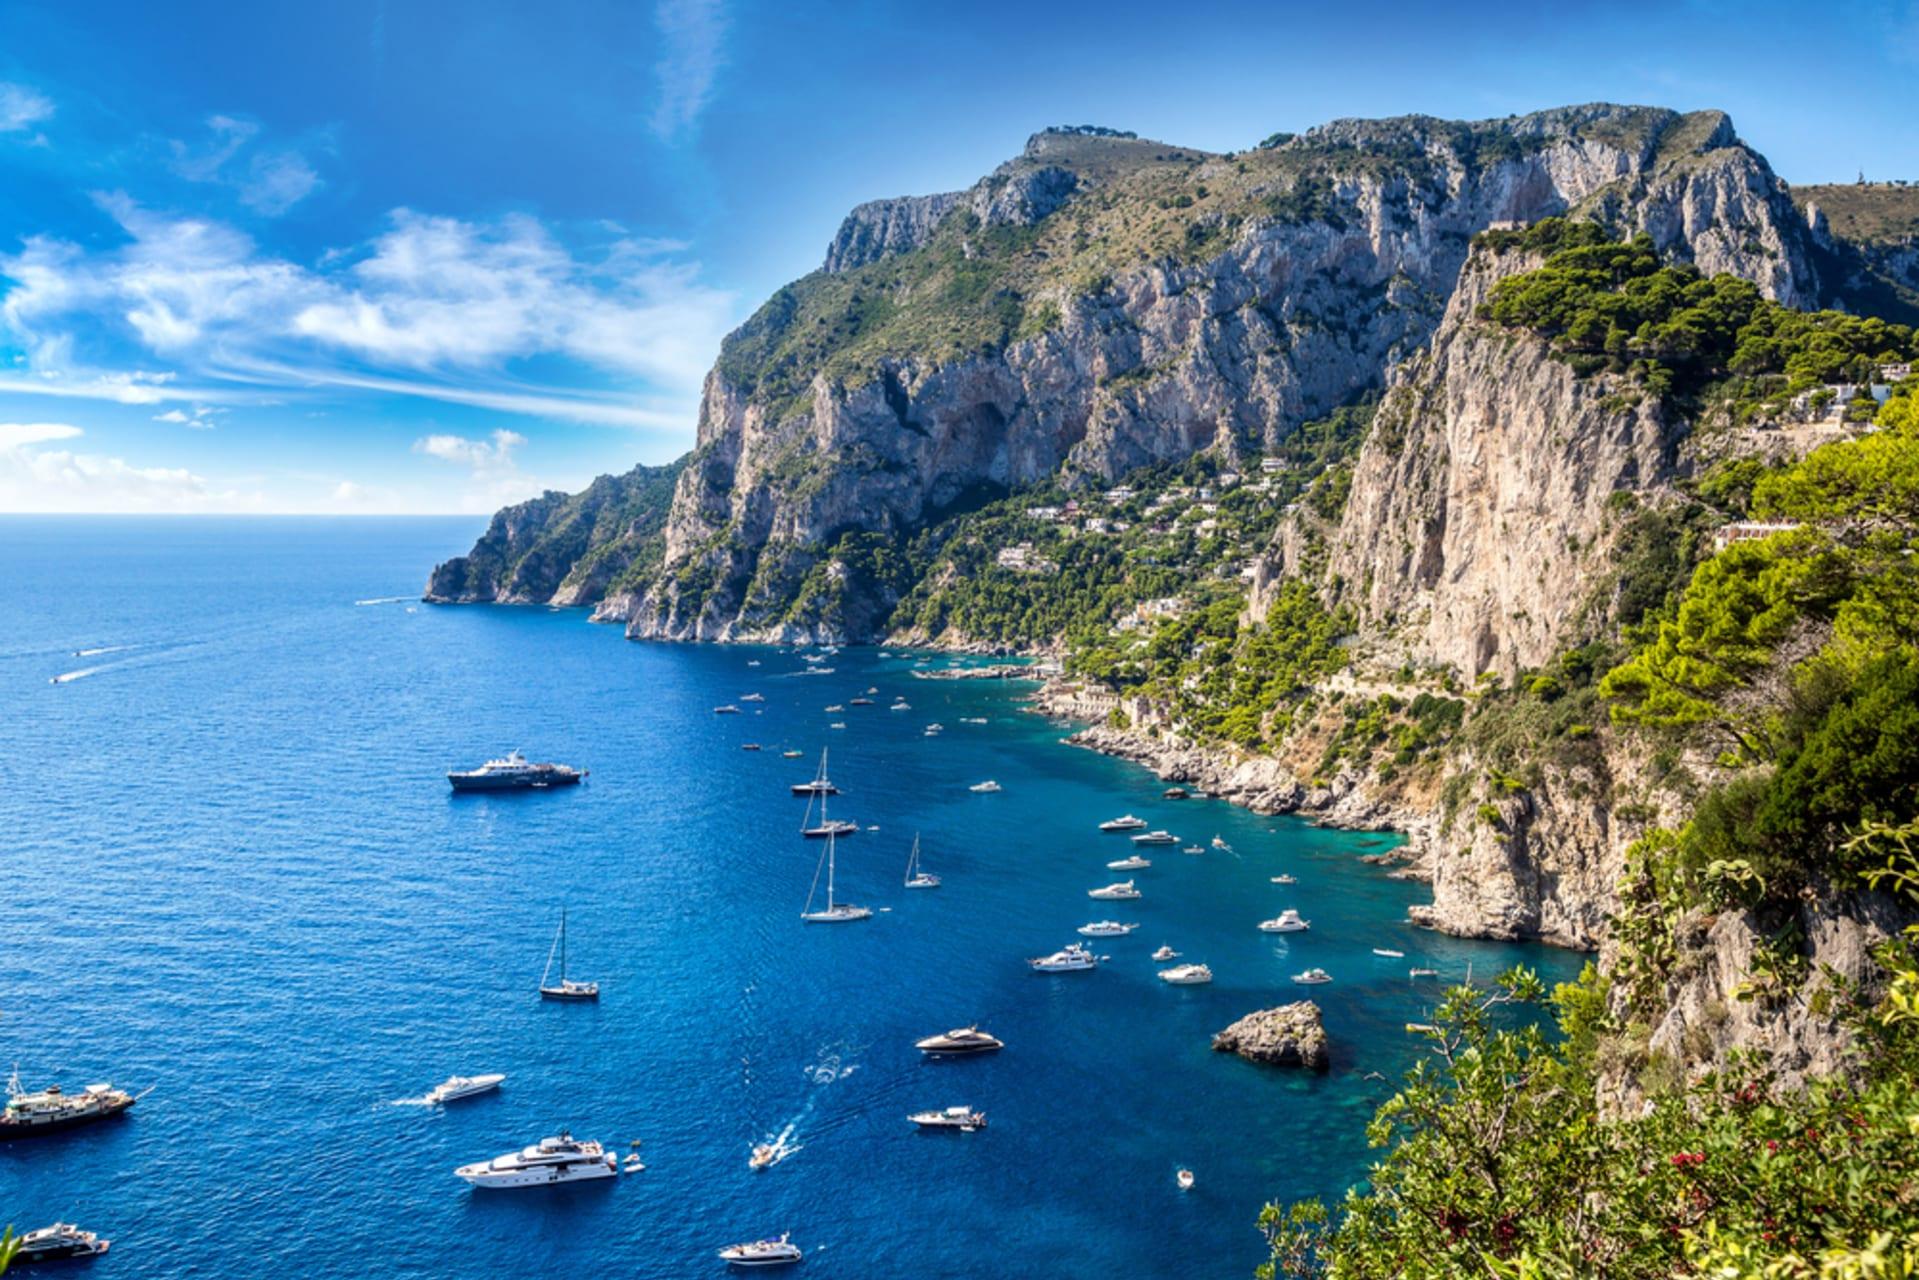 Capri Island - Capri: One Of The Most Beautiful Island In The World